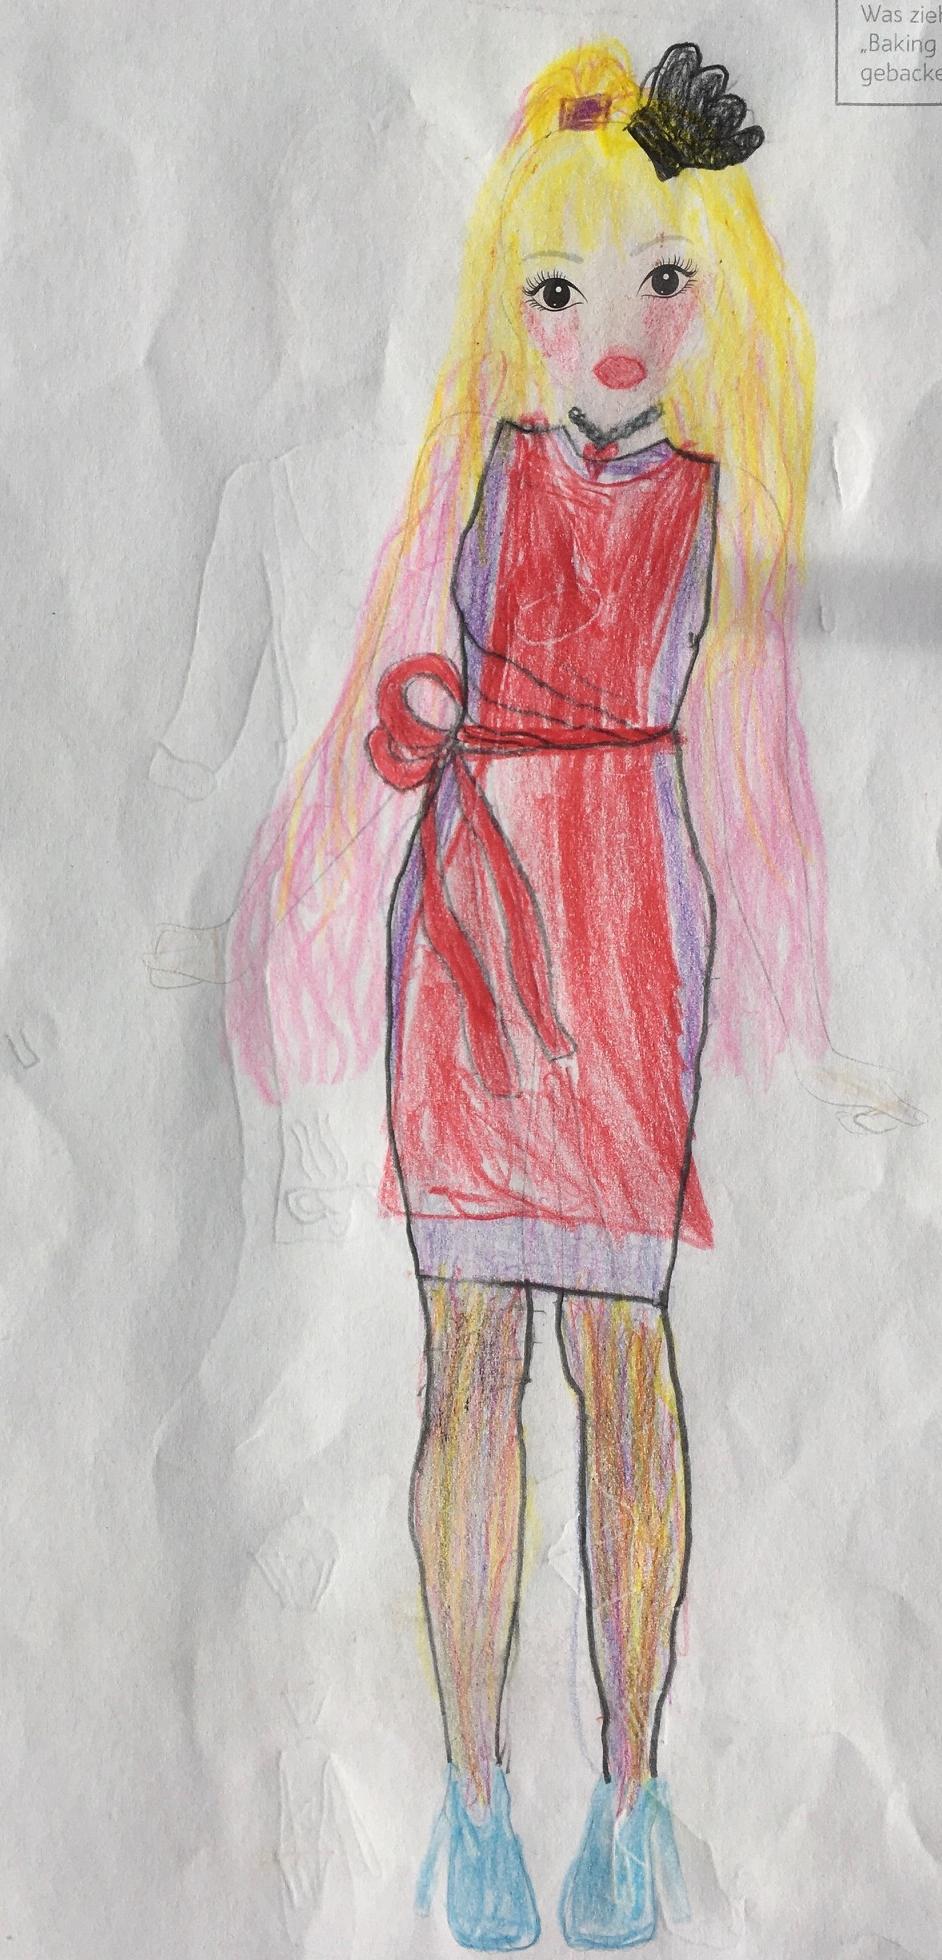 Mia F., 8 Jahre, aus Magdeburg